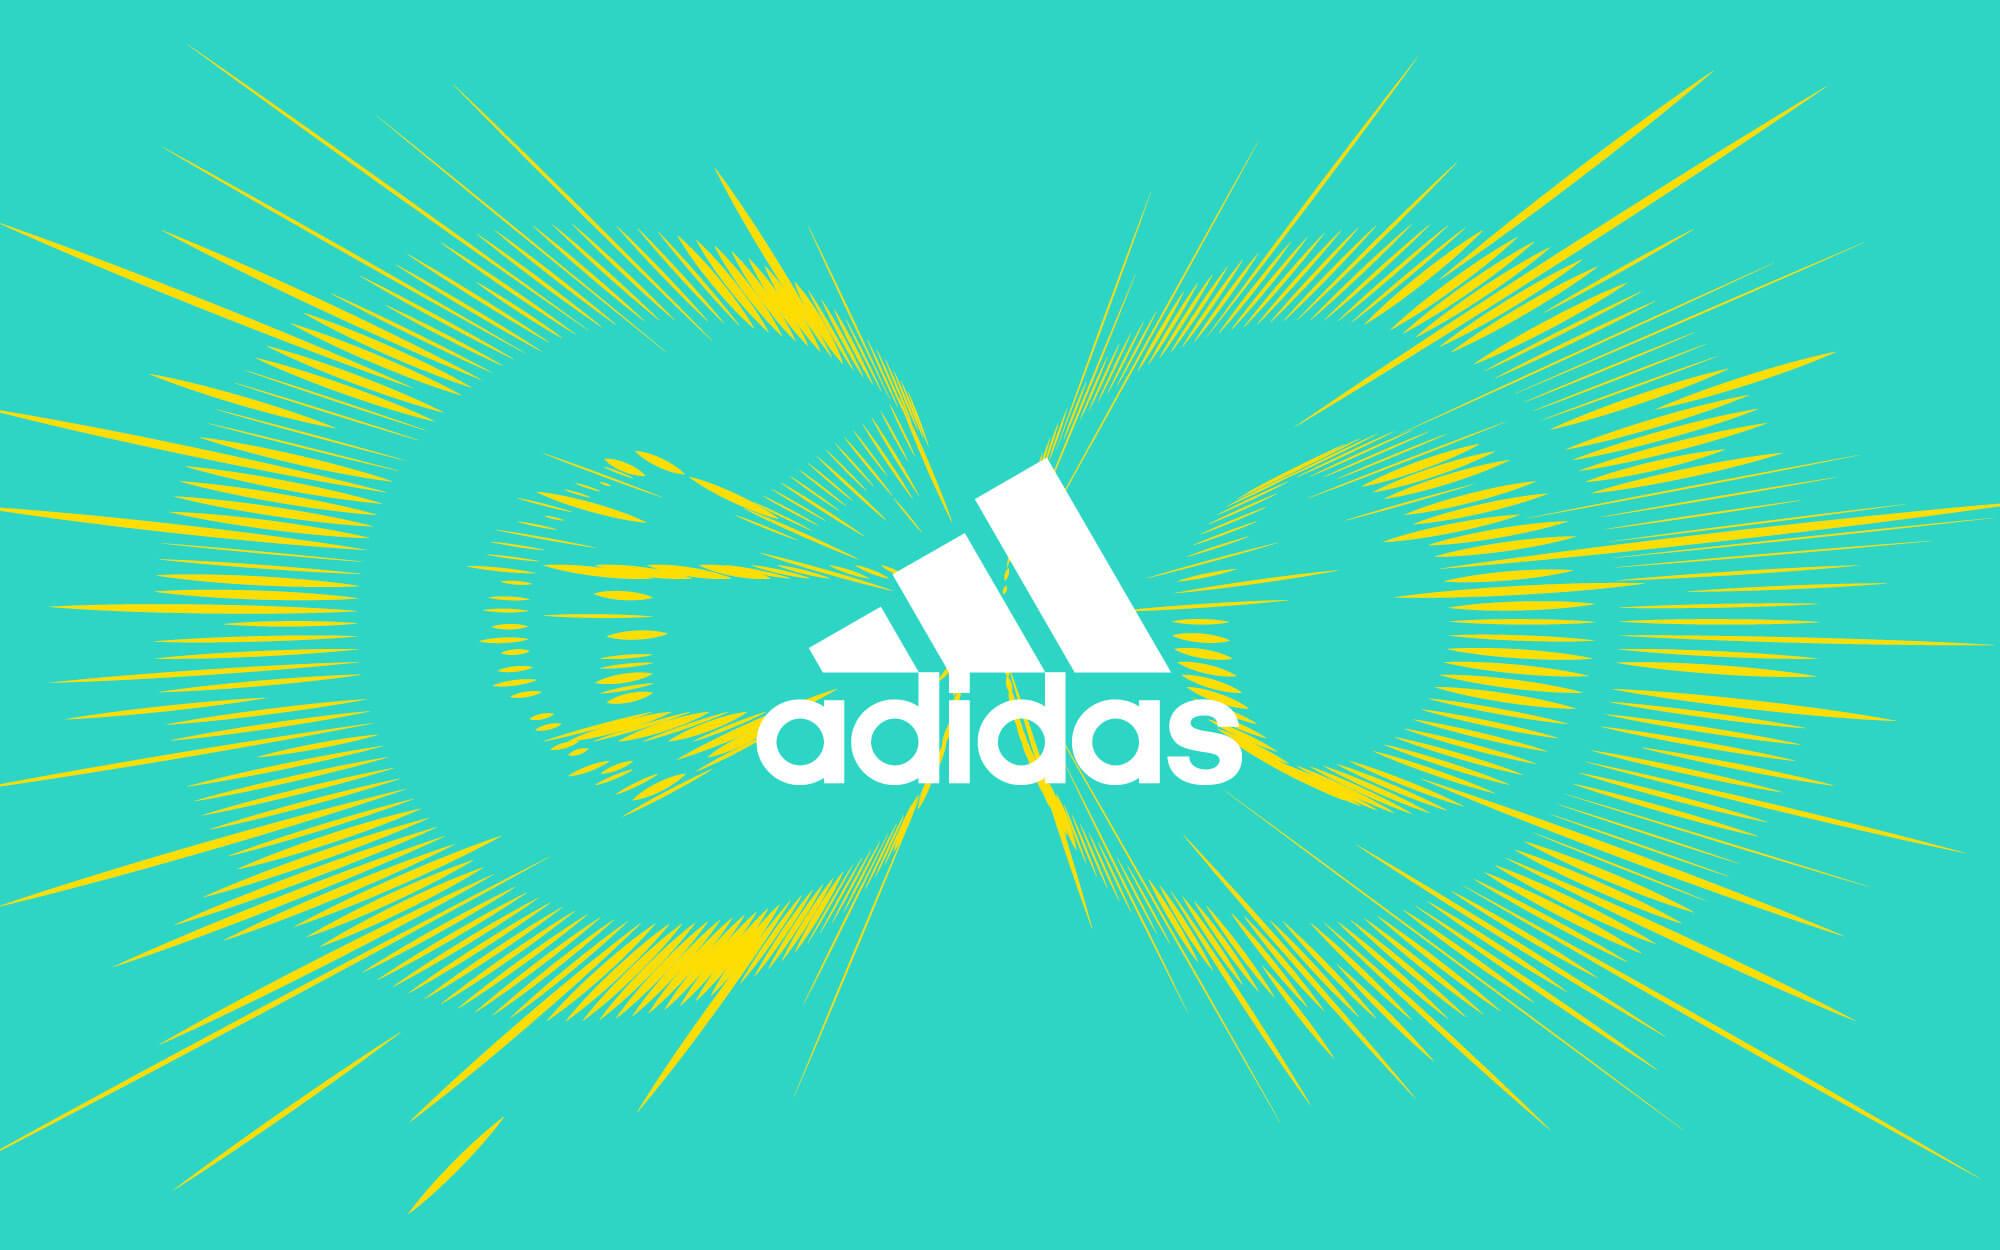 EIGA_adidas_TypeExploration_L_12